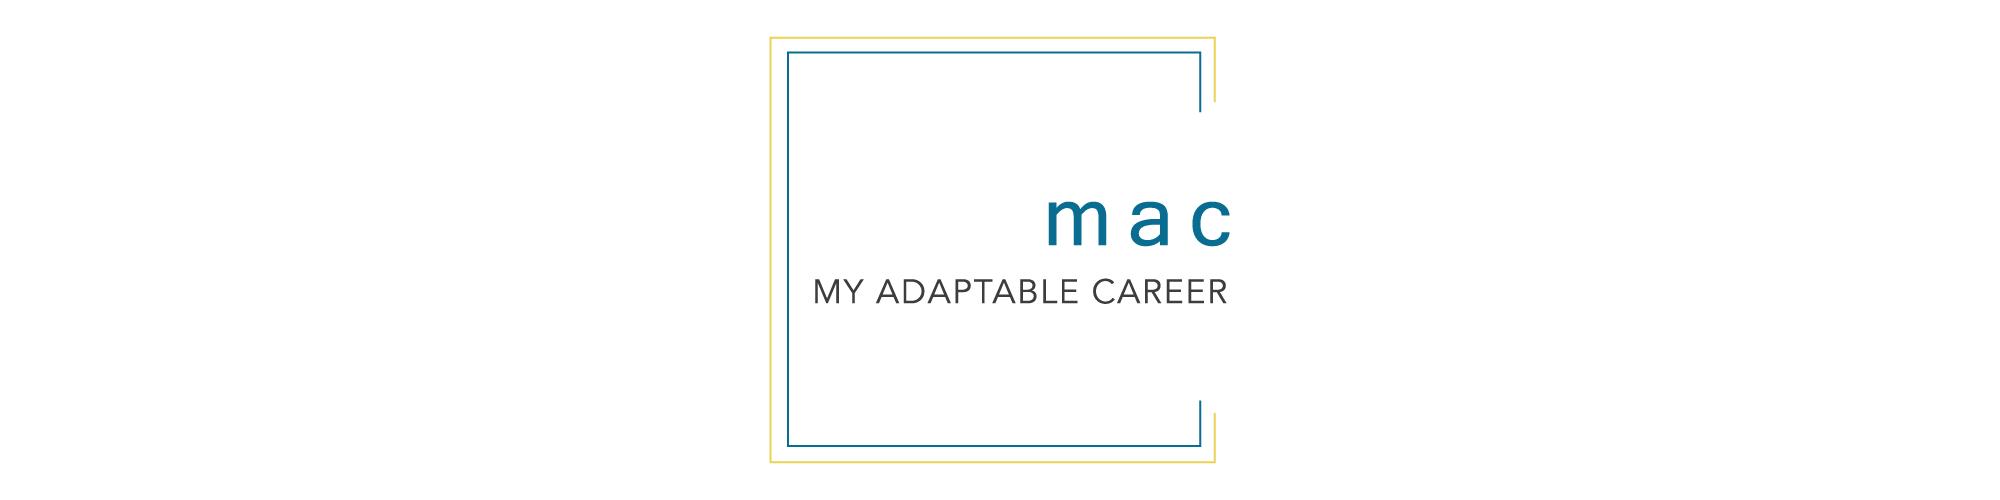 My Adaptable Career